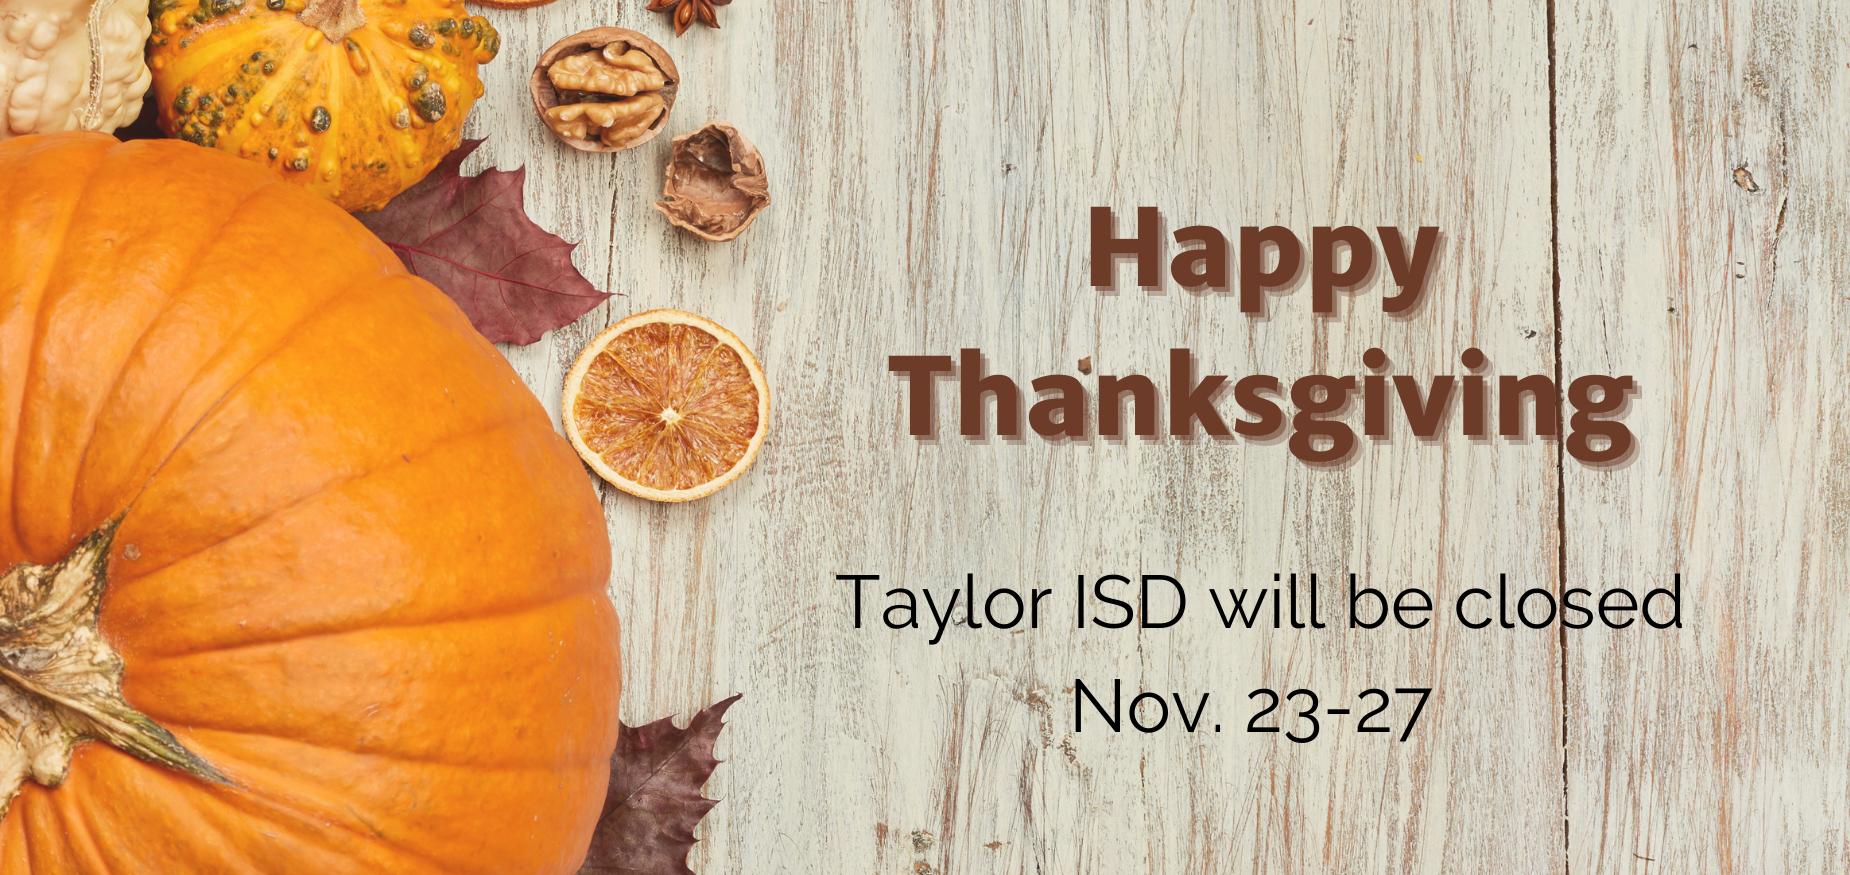 Taylor ISD closed 11/23-11/27